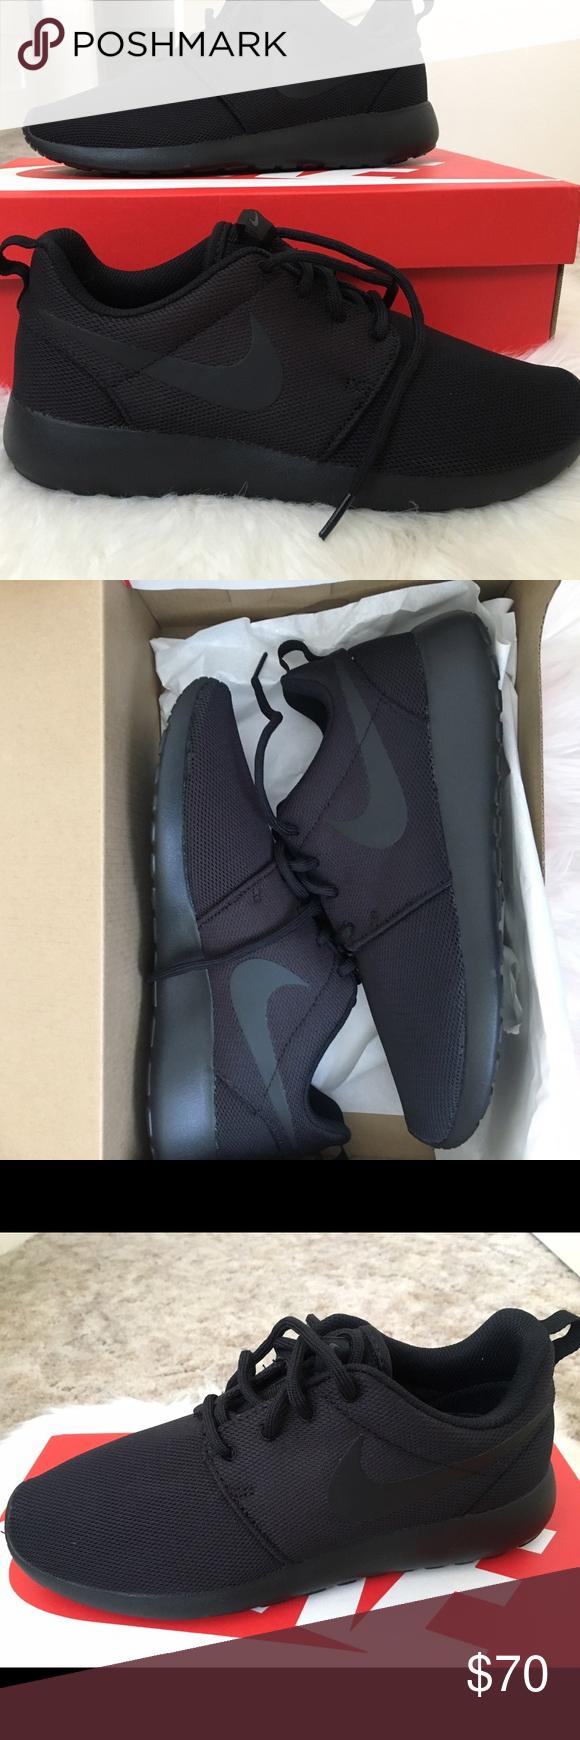 Nike Roche All Negro Nwt Zapatos Zapatillas Zapatillas Zapatos De Deporte Zapatillas Nike Y Negro 15e91b